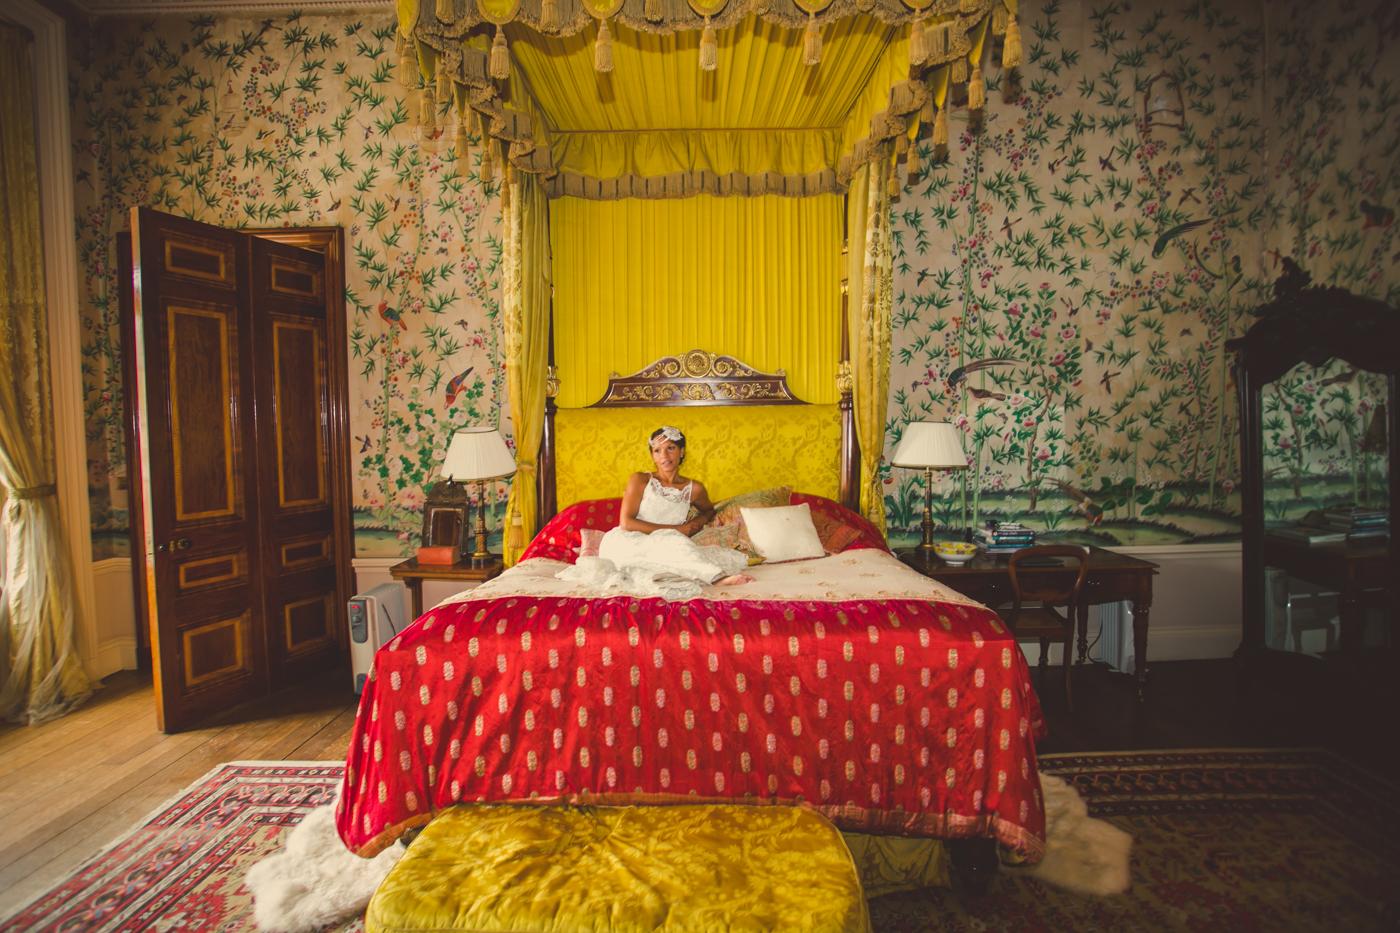 123 Donna and John Wedding Photography at Belvoir Castle www.belvoircastle.com UK by Mark Pugh.JPG